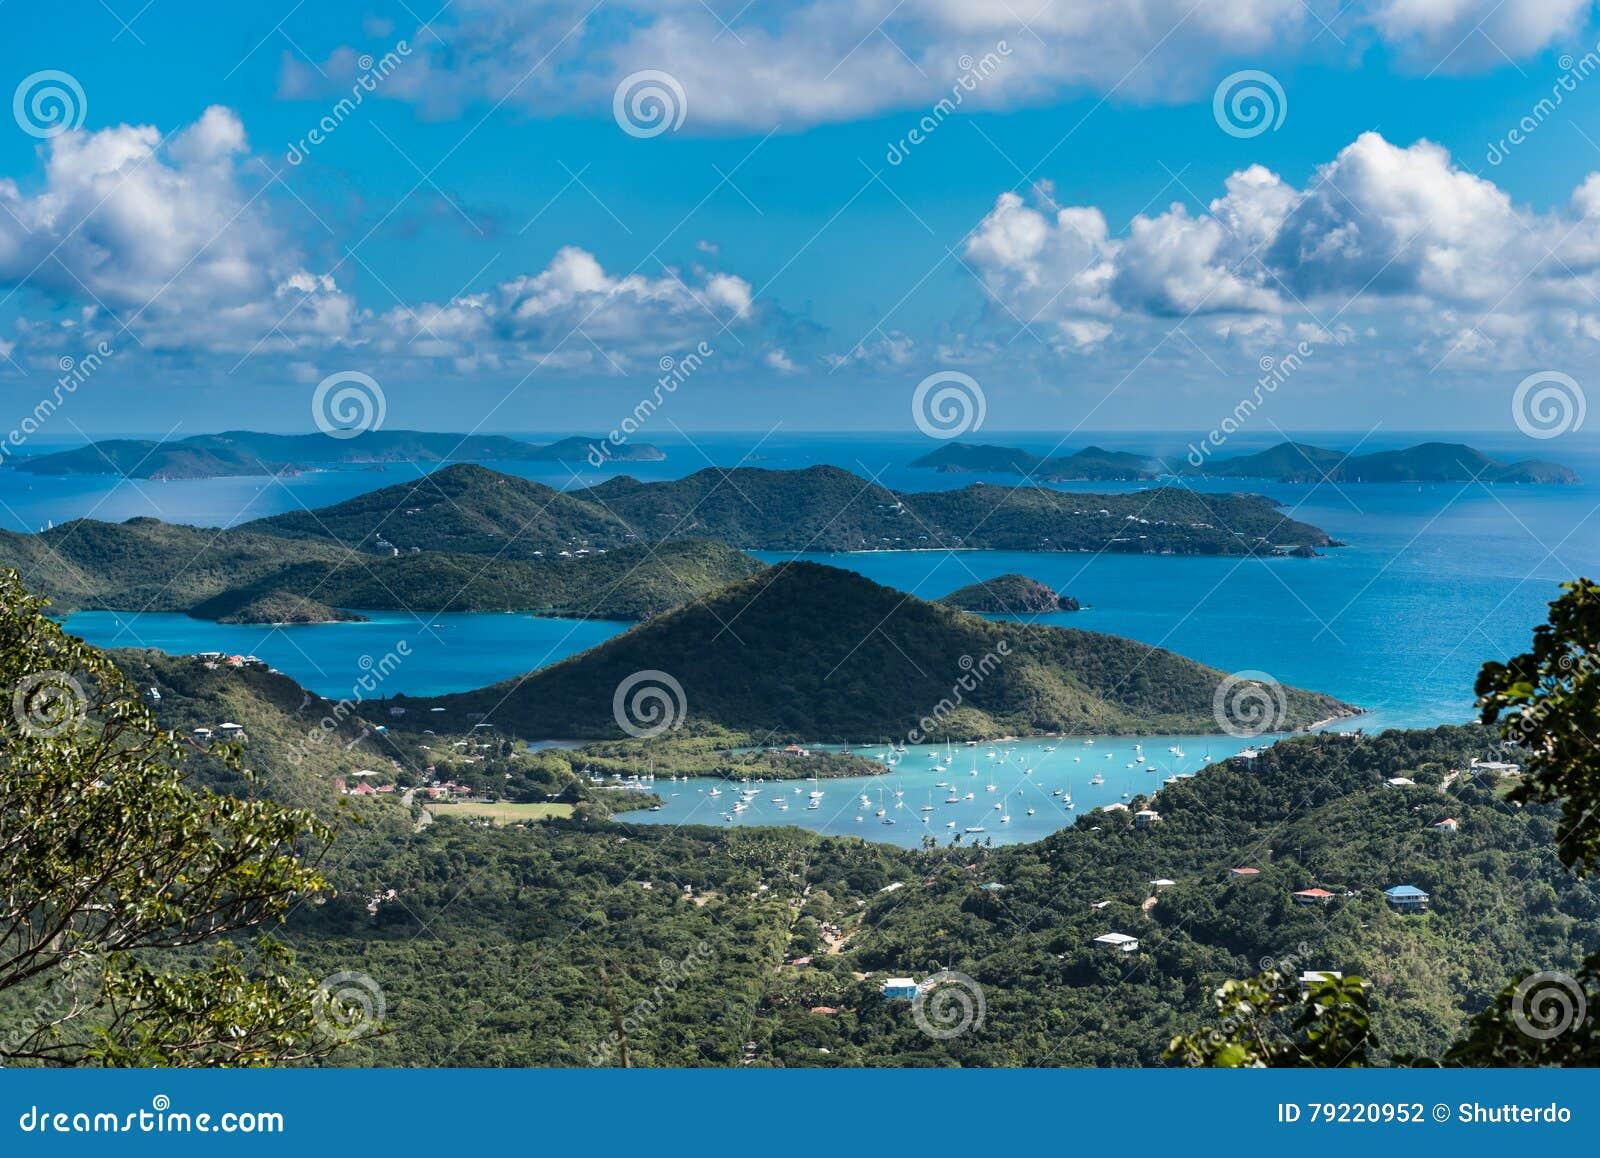 Cloud shaded archipelago off the coast of St. Johns island